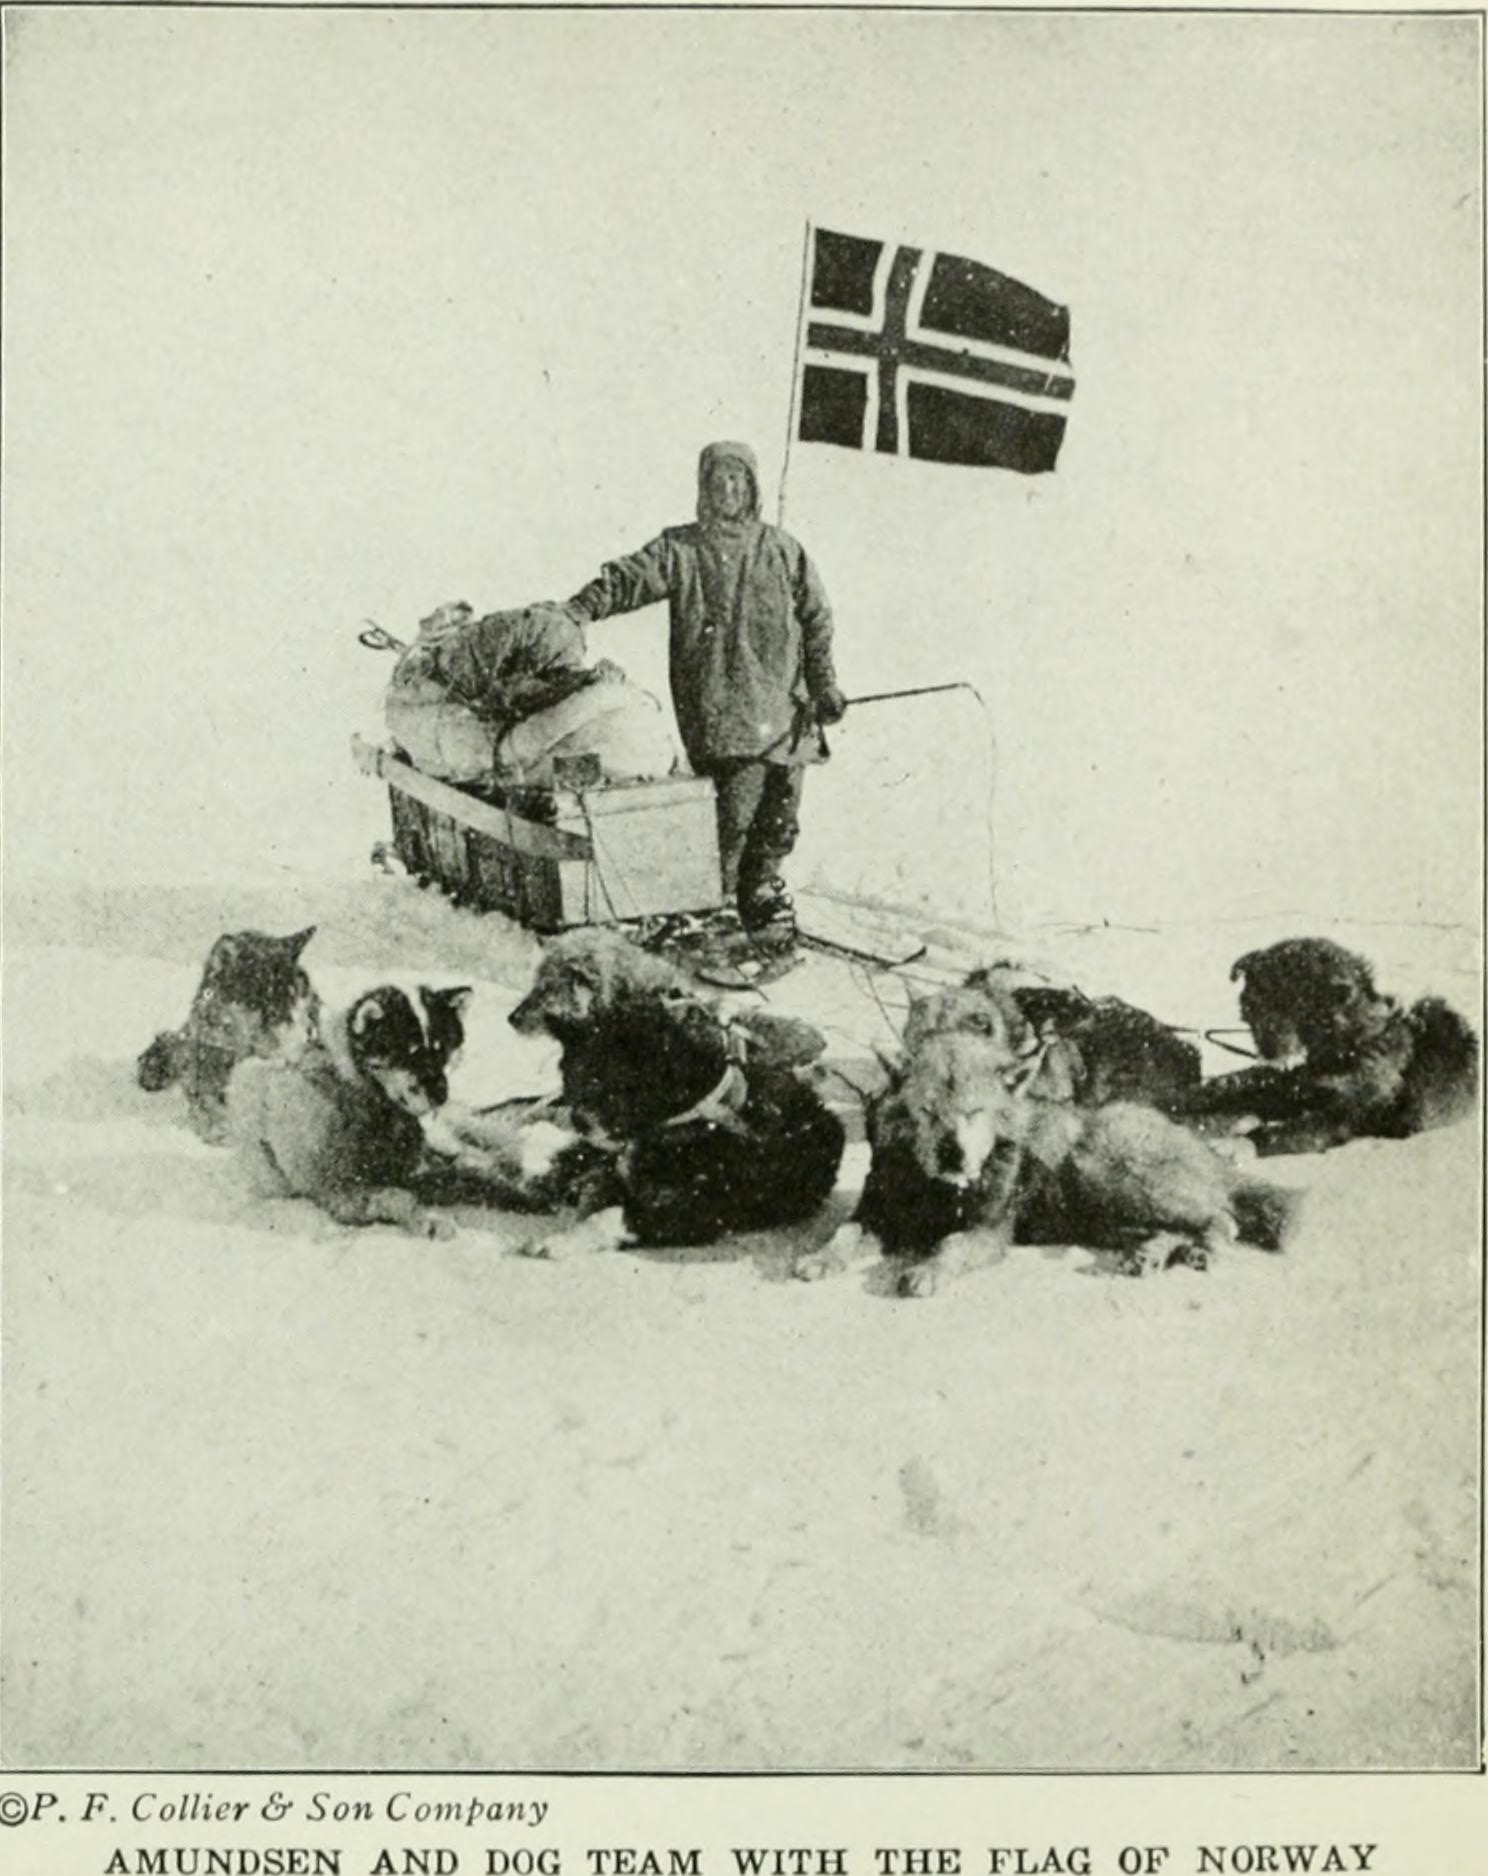 Roald Amundsen and Dog Team